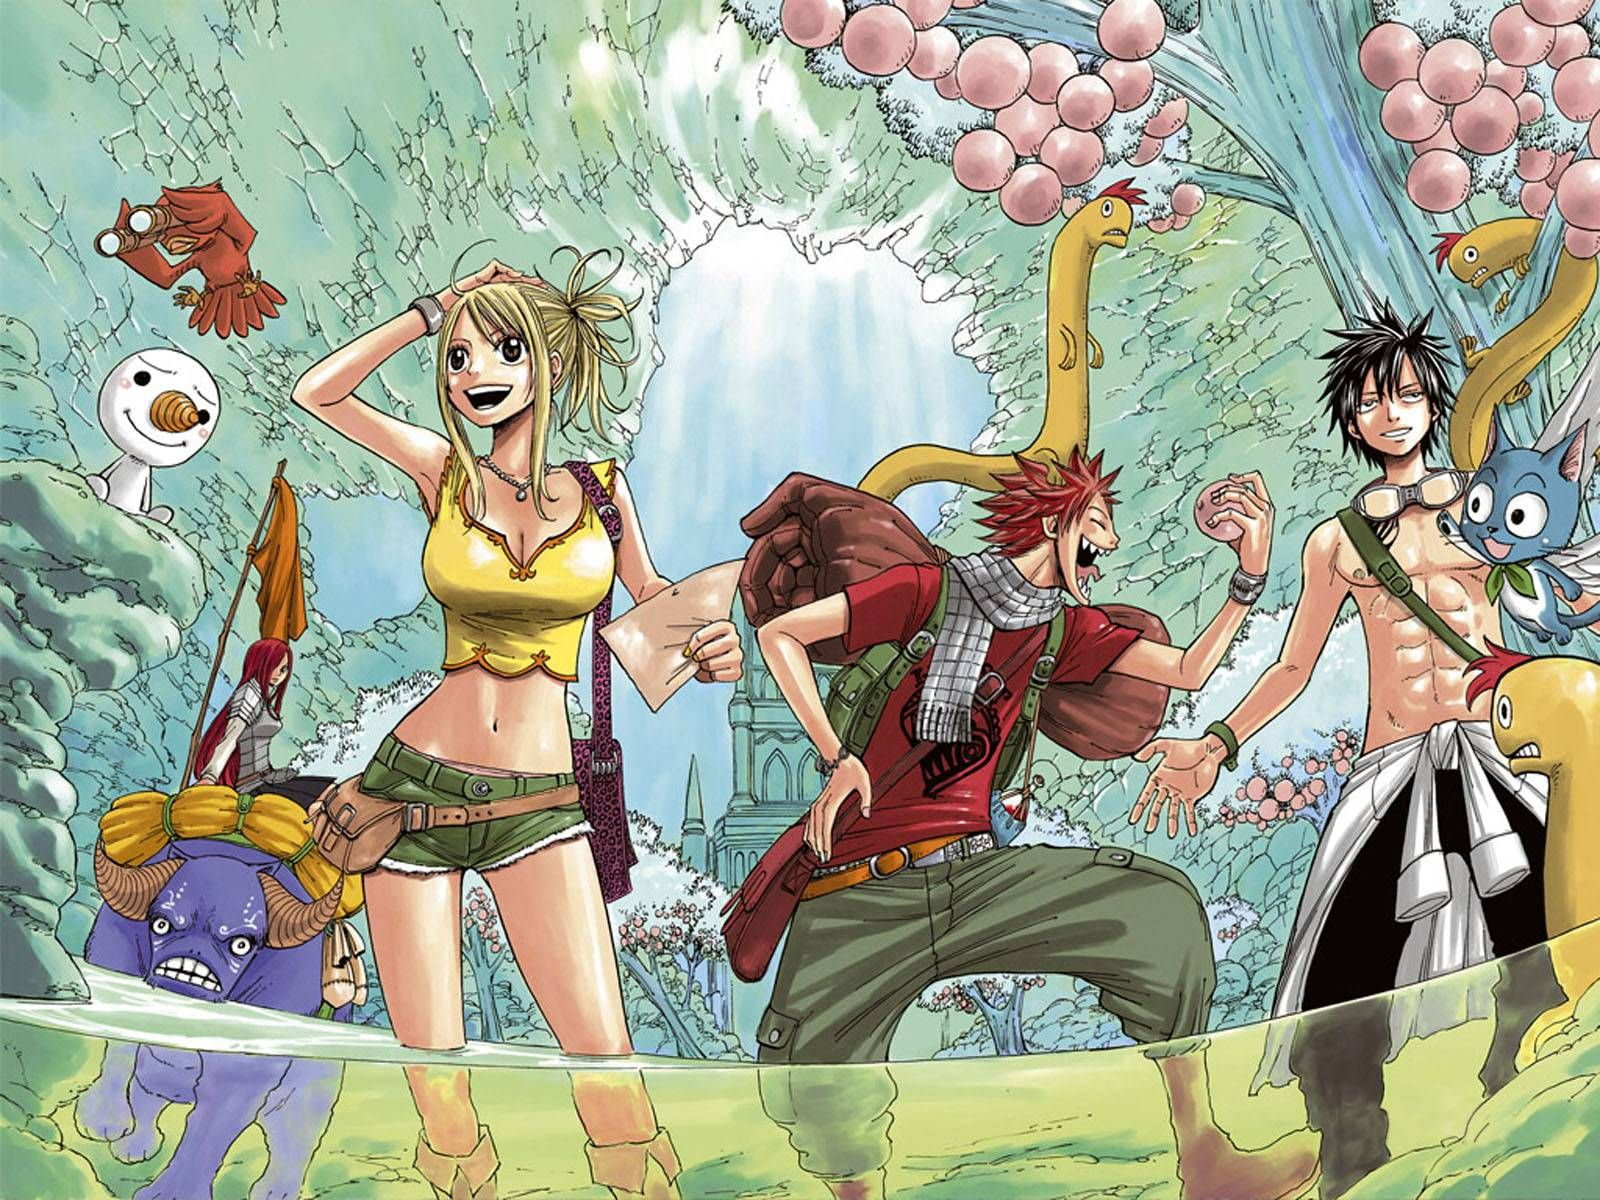 Fairy Tail Wallpaper Fairy Tail Wallpaper Mangagrounds Read Fairy Tail Manga Online Fairy Tail Forums